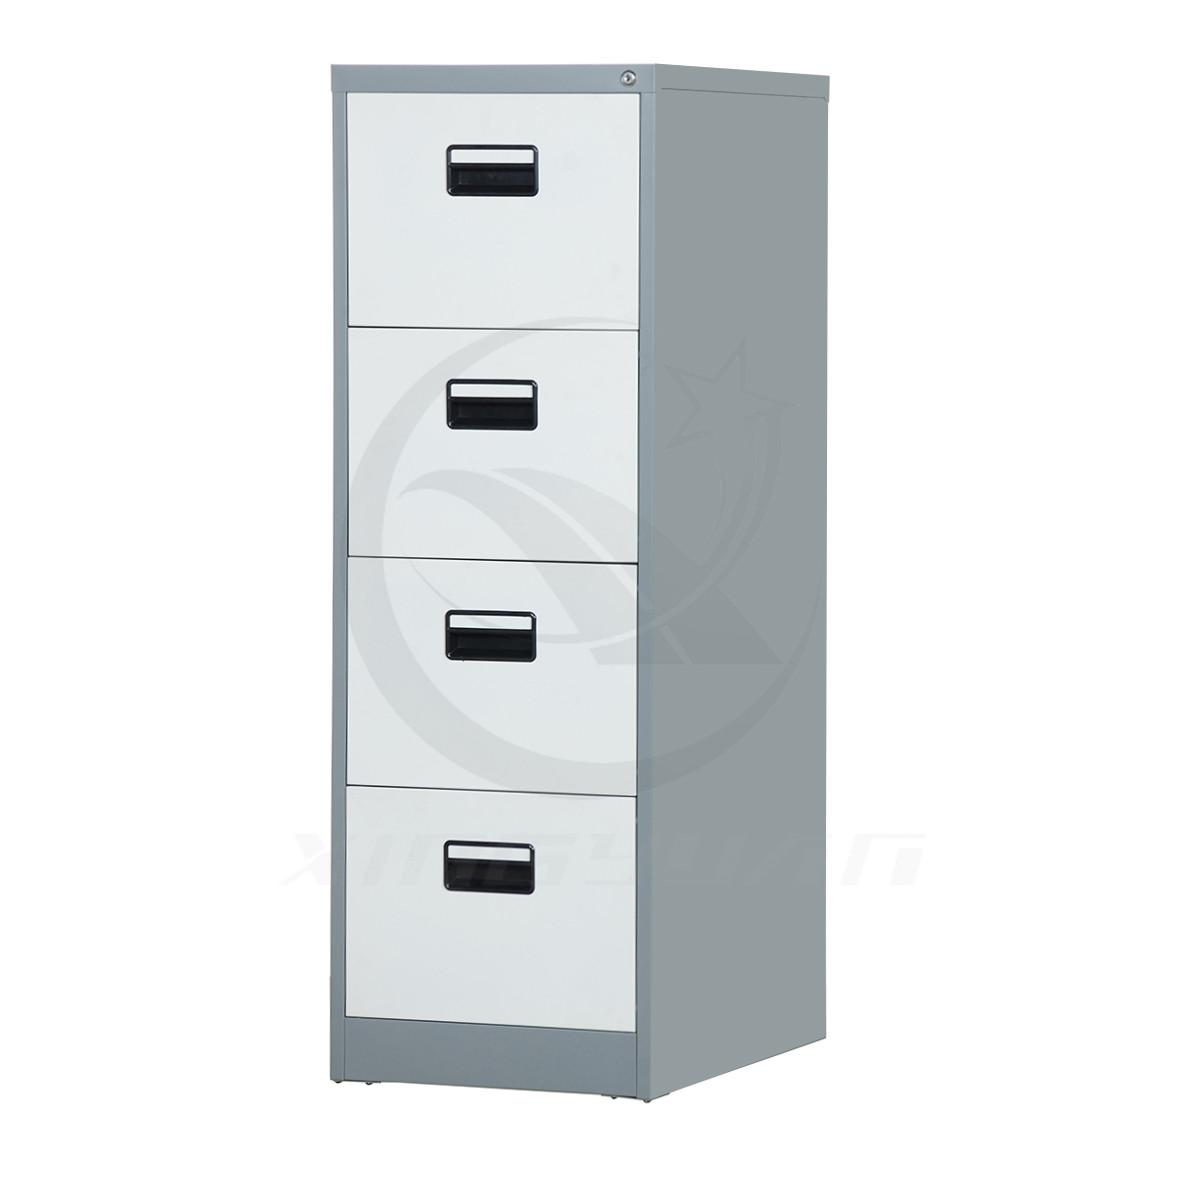 Cheap Shaw Walker 4 drawer metal file cabinet